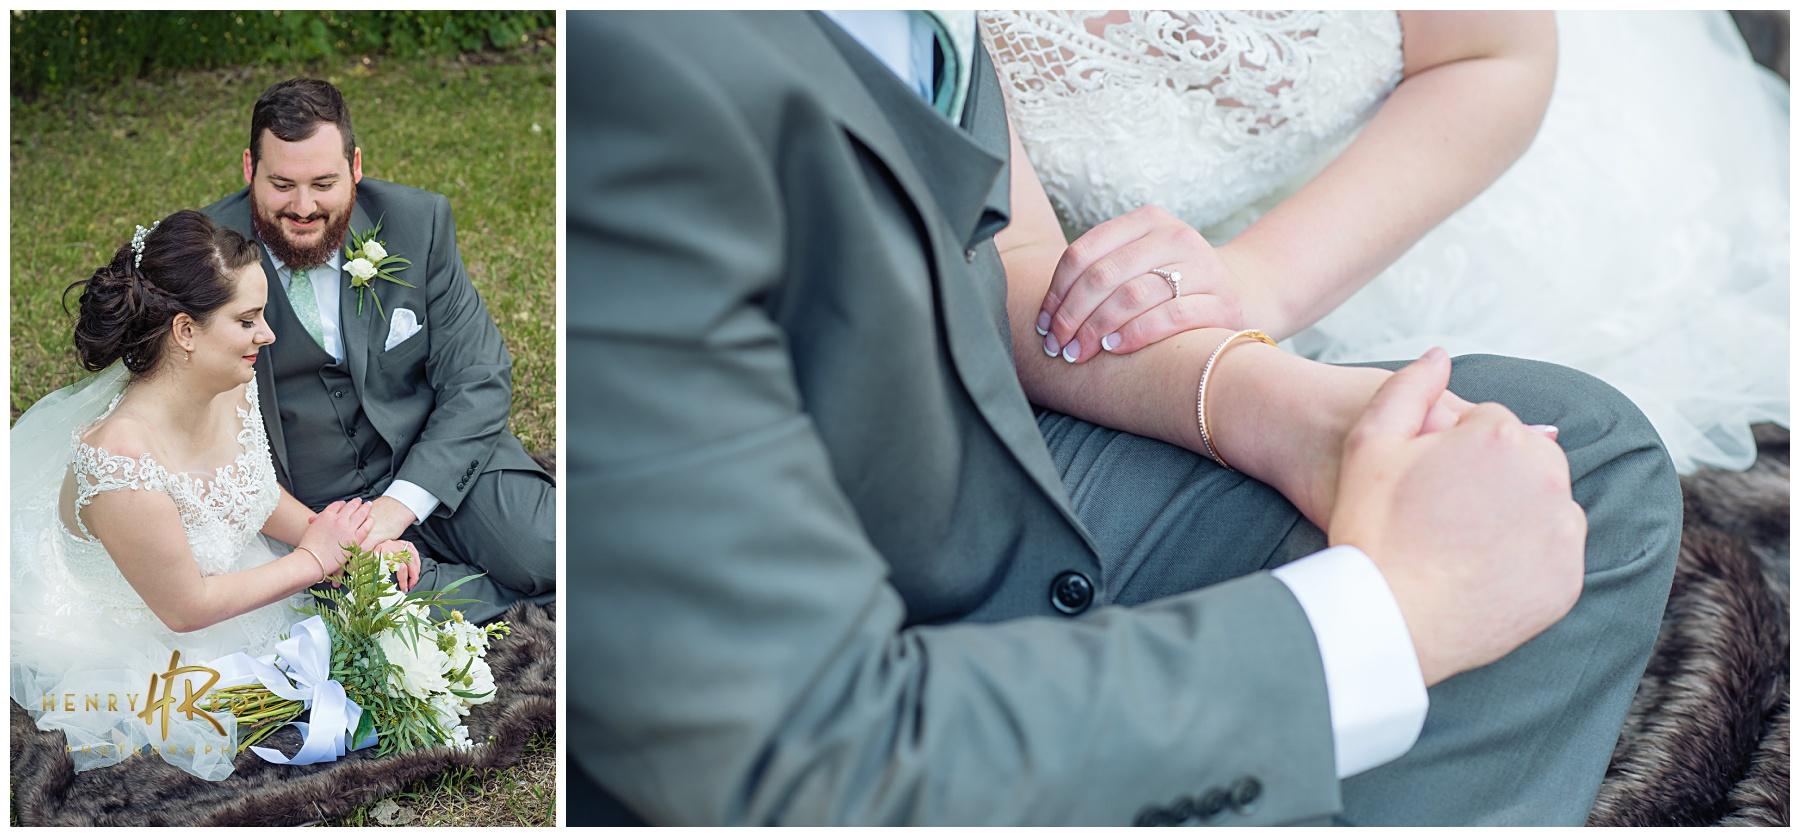 Rapid City Wedding Photographer007.jpg